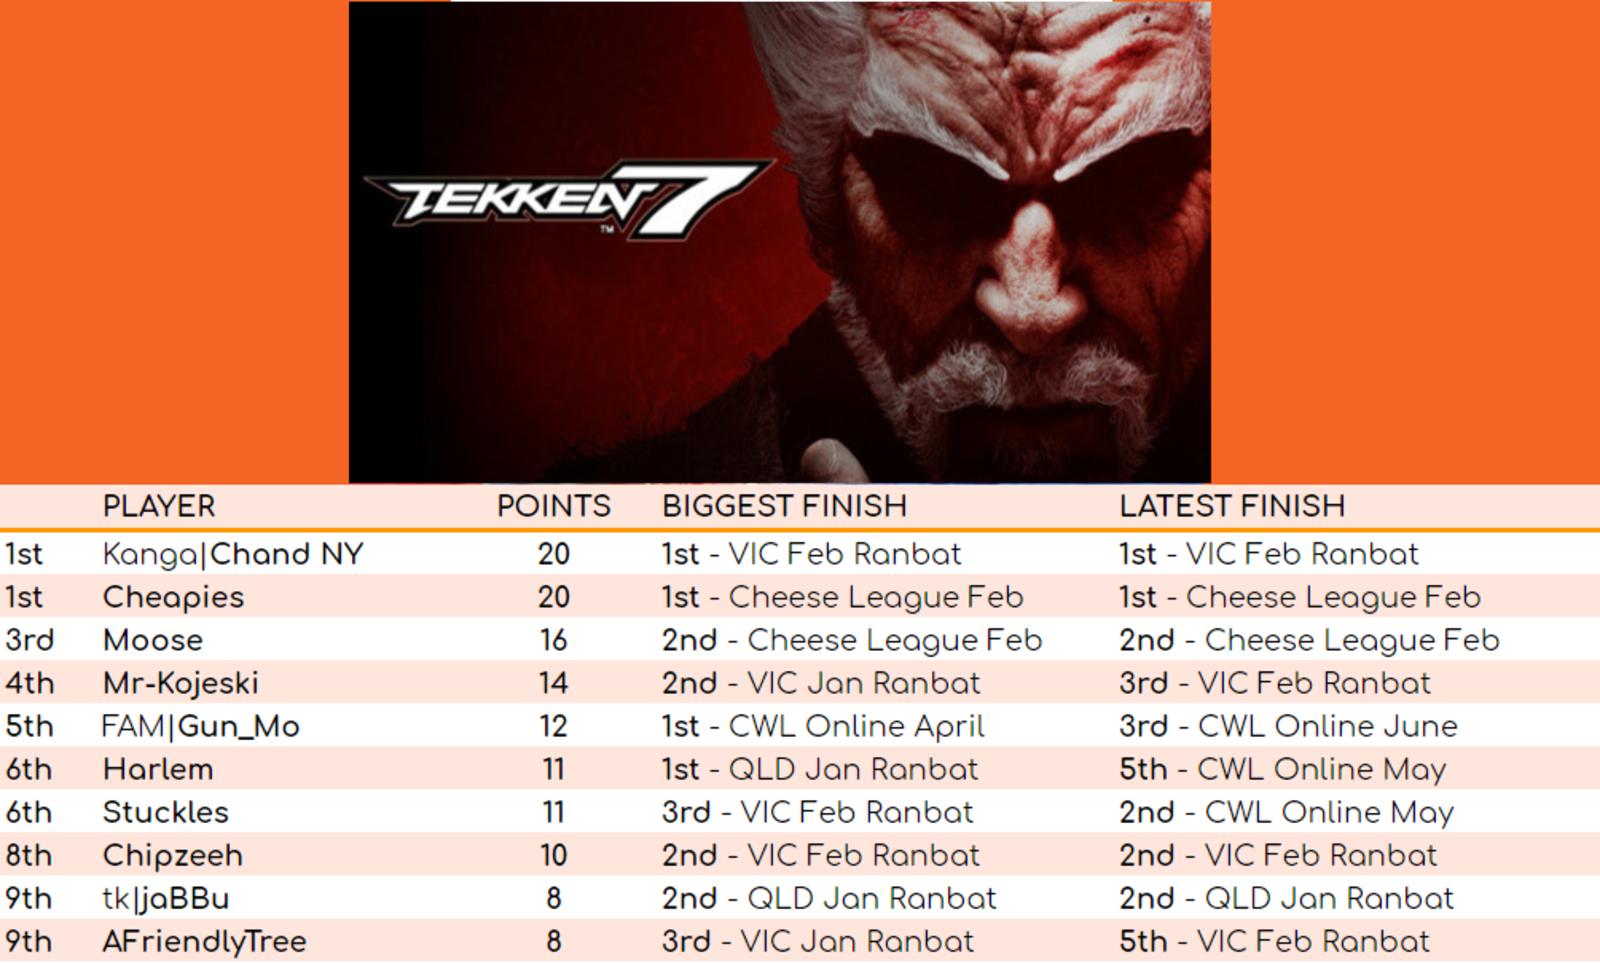 Tekken 7 Leaderboard